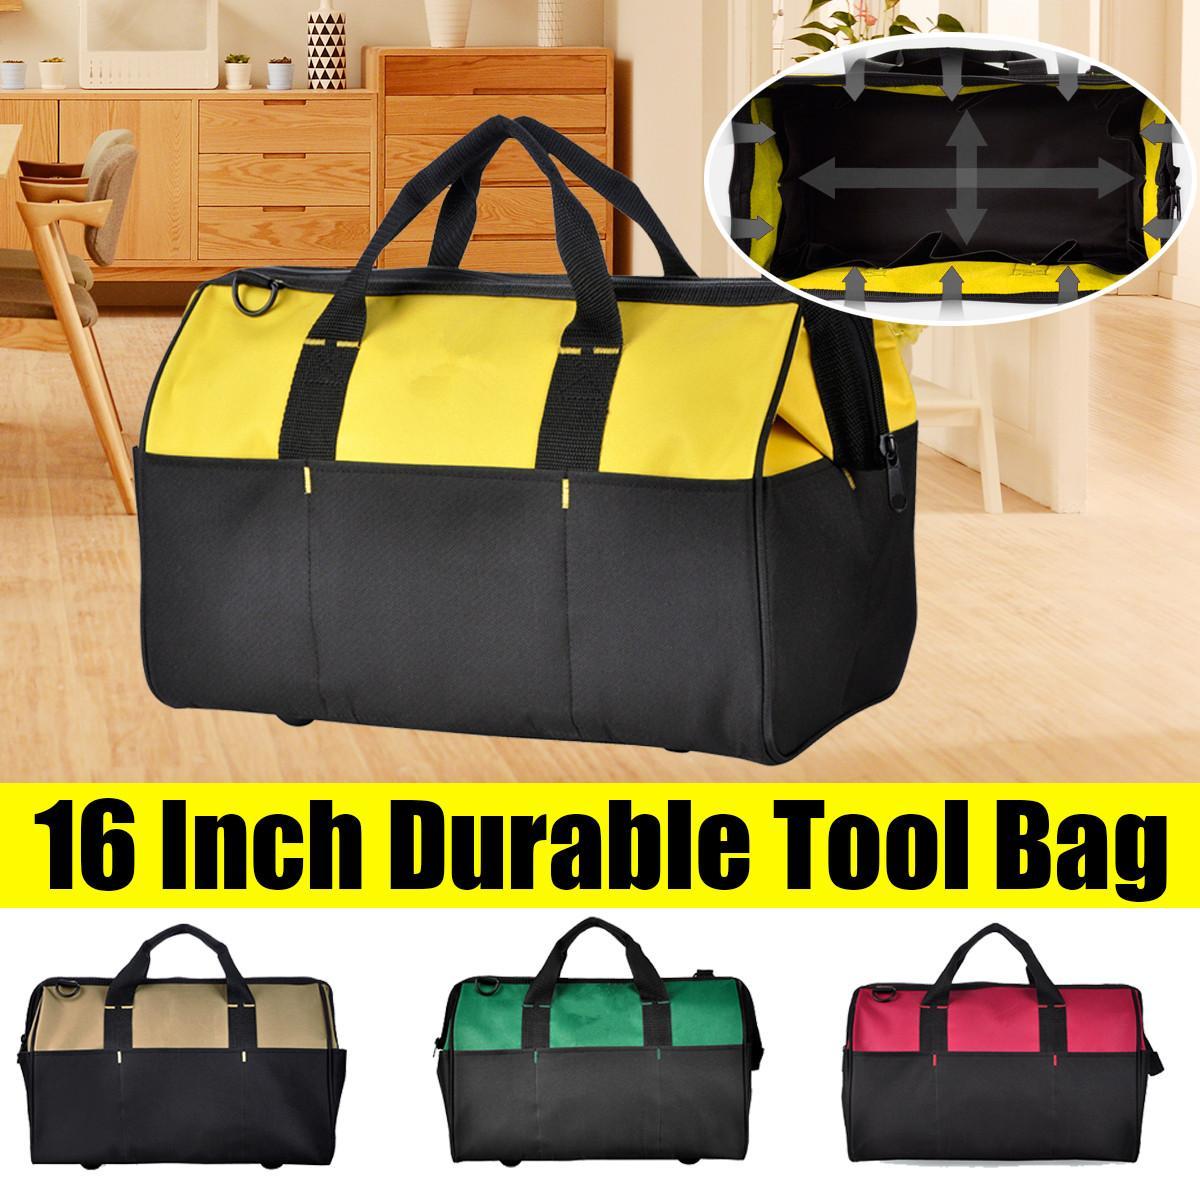 16 Inch Oxford Tool Bag Waterproof Hand Tool Storage Bag Large Capacity Adjustable Shoulder Strap Storage Electrician Bag